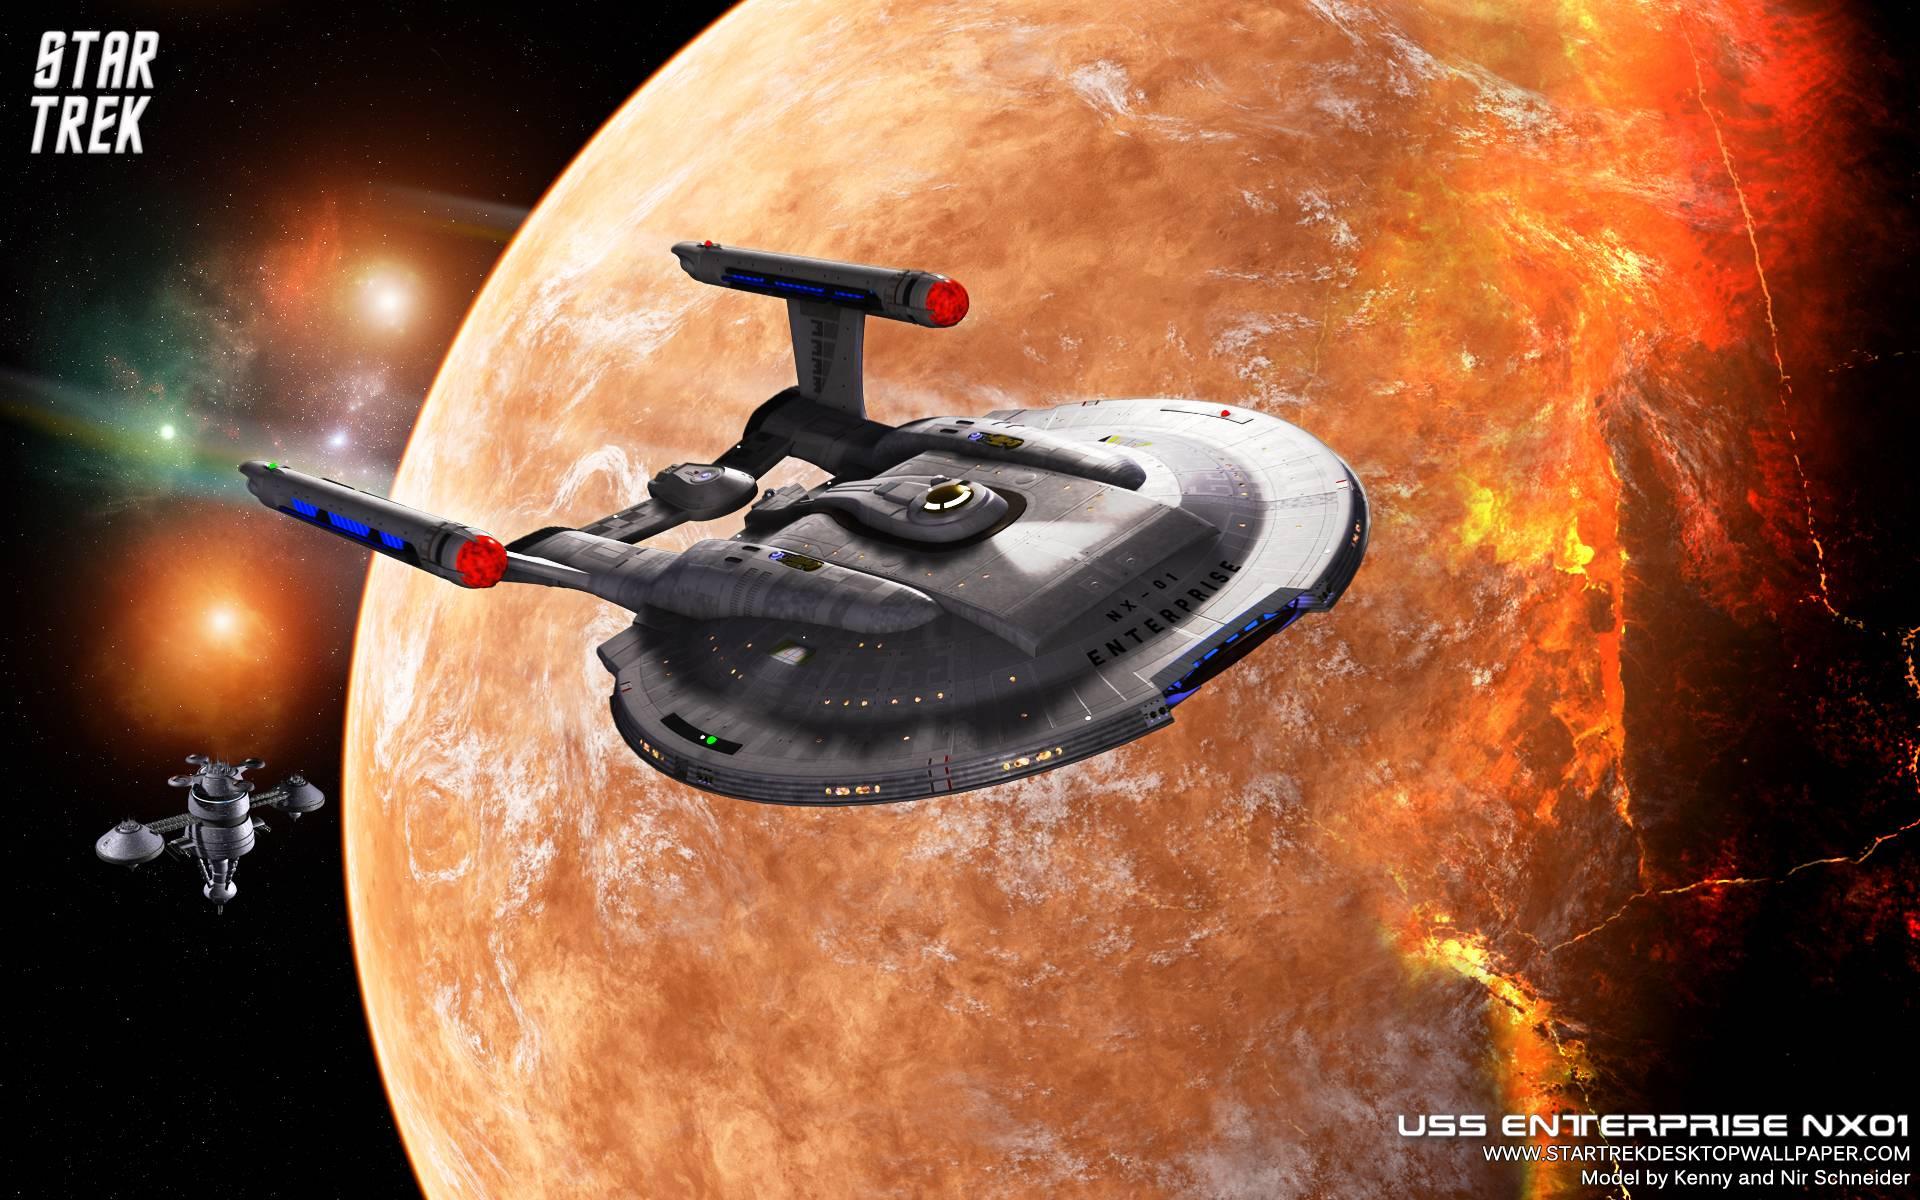 Star Trek Enterprise Nx01 On Burning Planet, Free Star - Star Trek Enterprise Planets , HD Wallpaper & Backgrounds